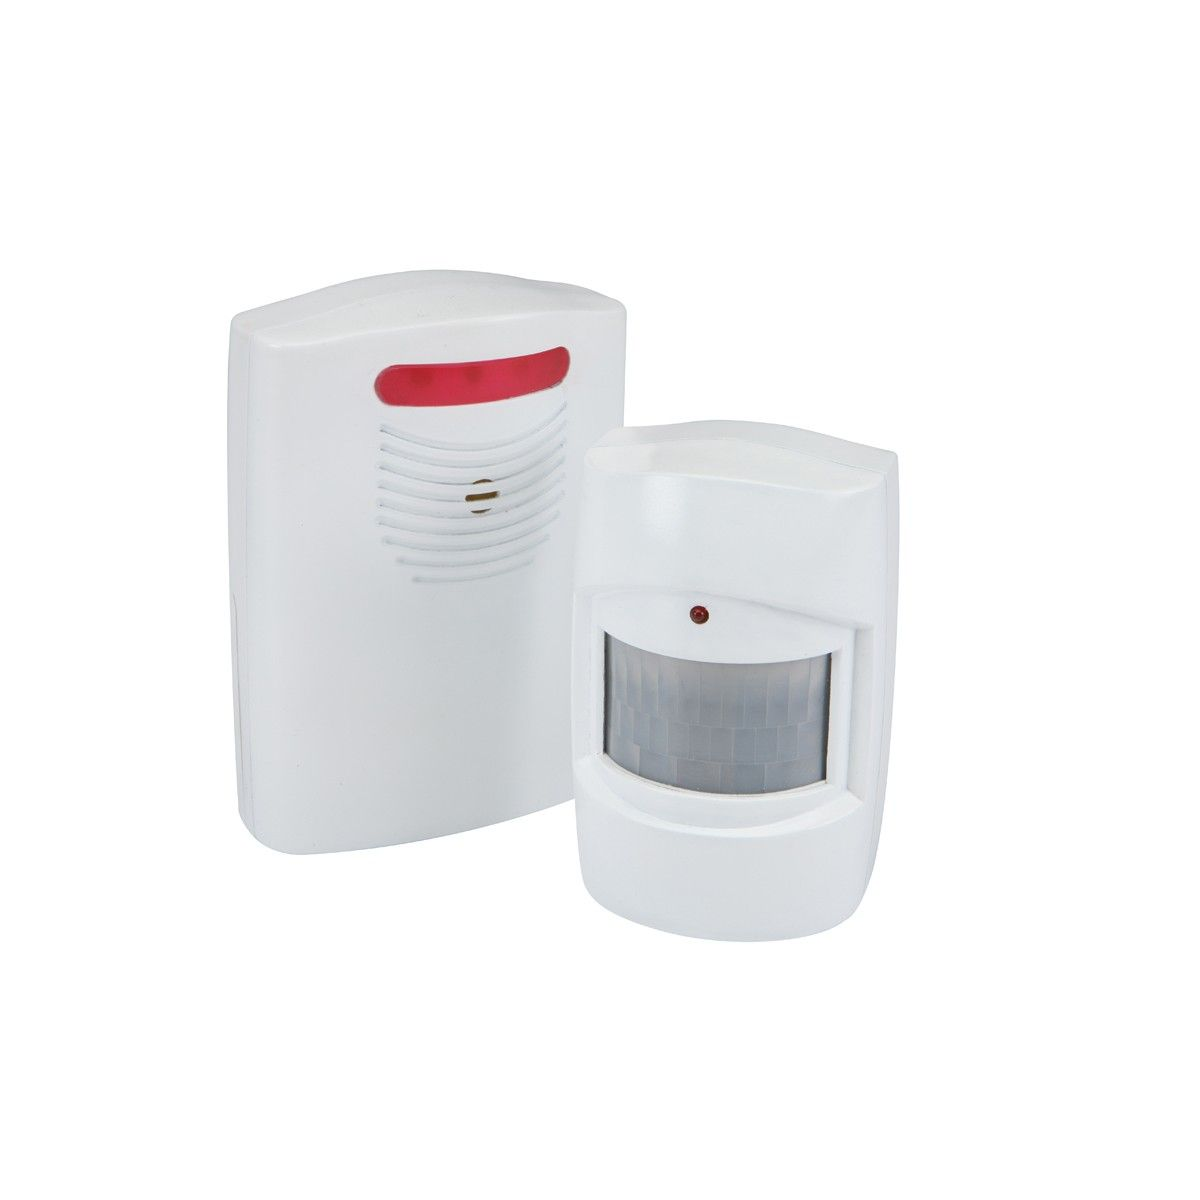 bunker hill security 69590 wireless security alert system survival rh pinterest com